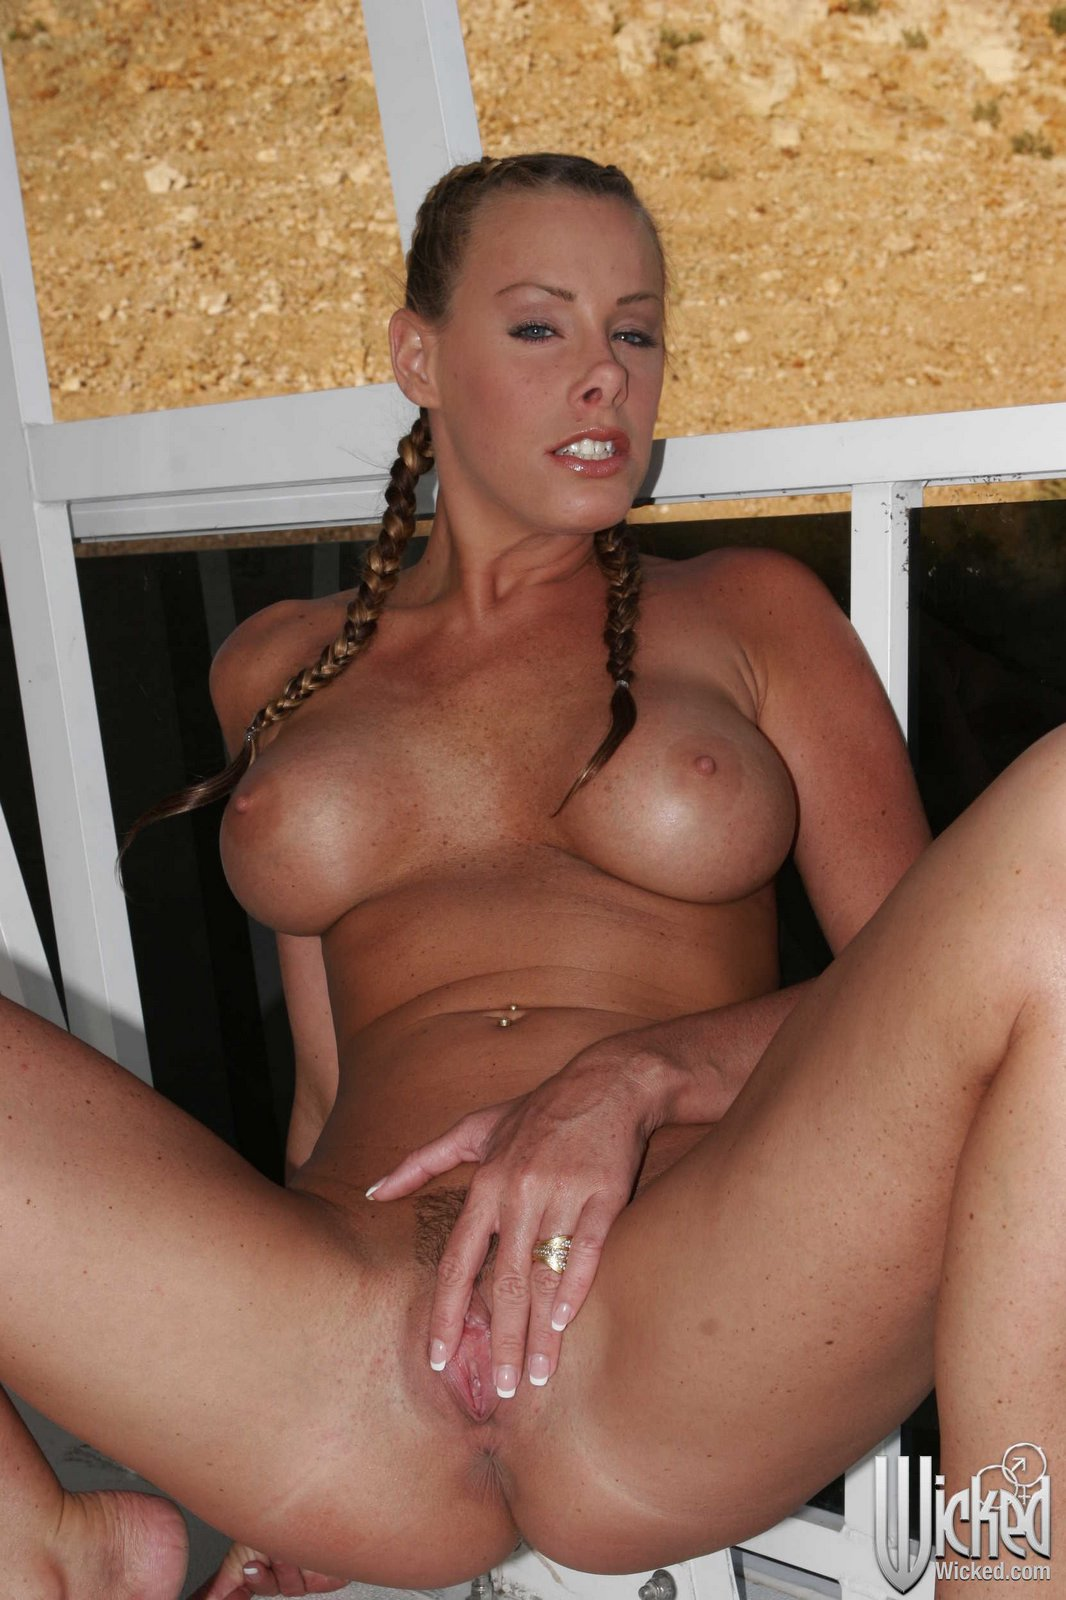 Nicole sheridan porn sites excellent topic